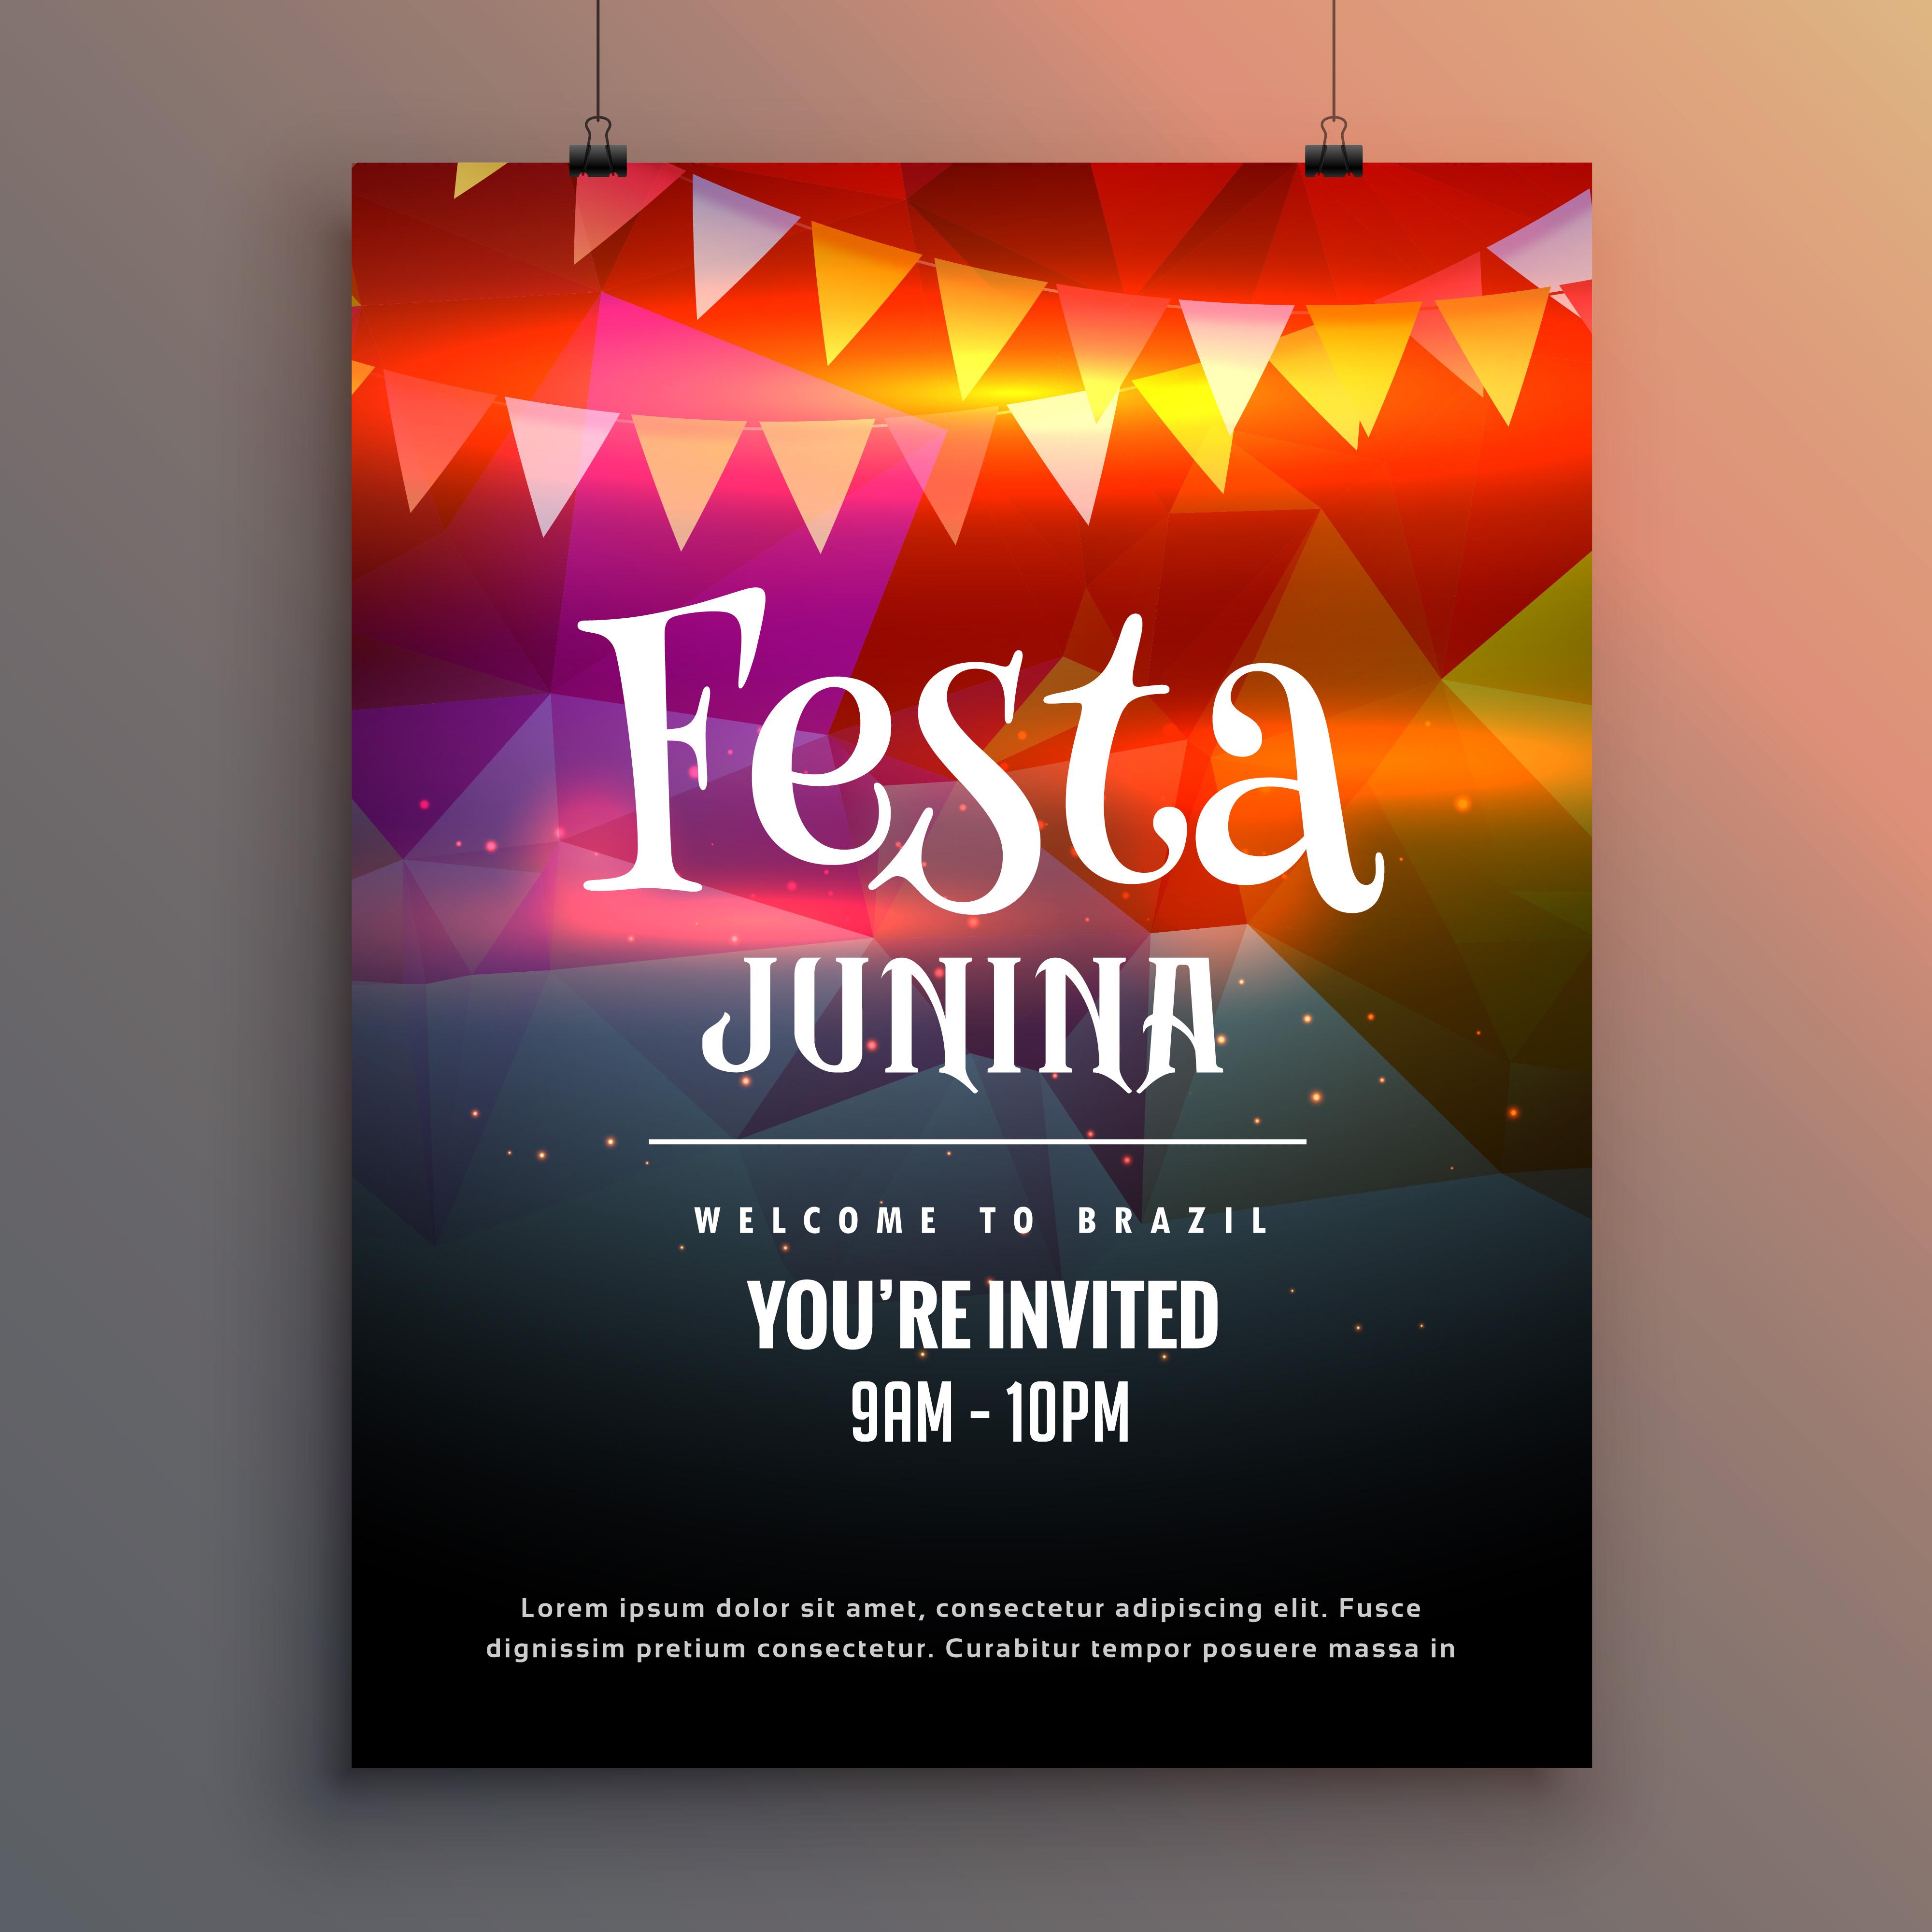 festa junina party invitation flyer design template download free